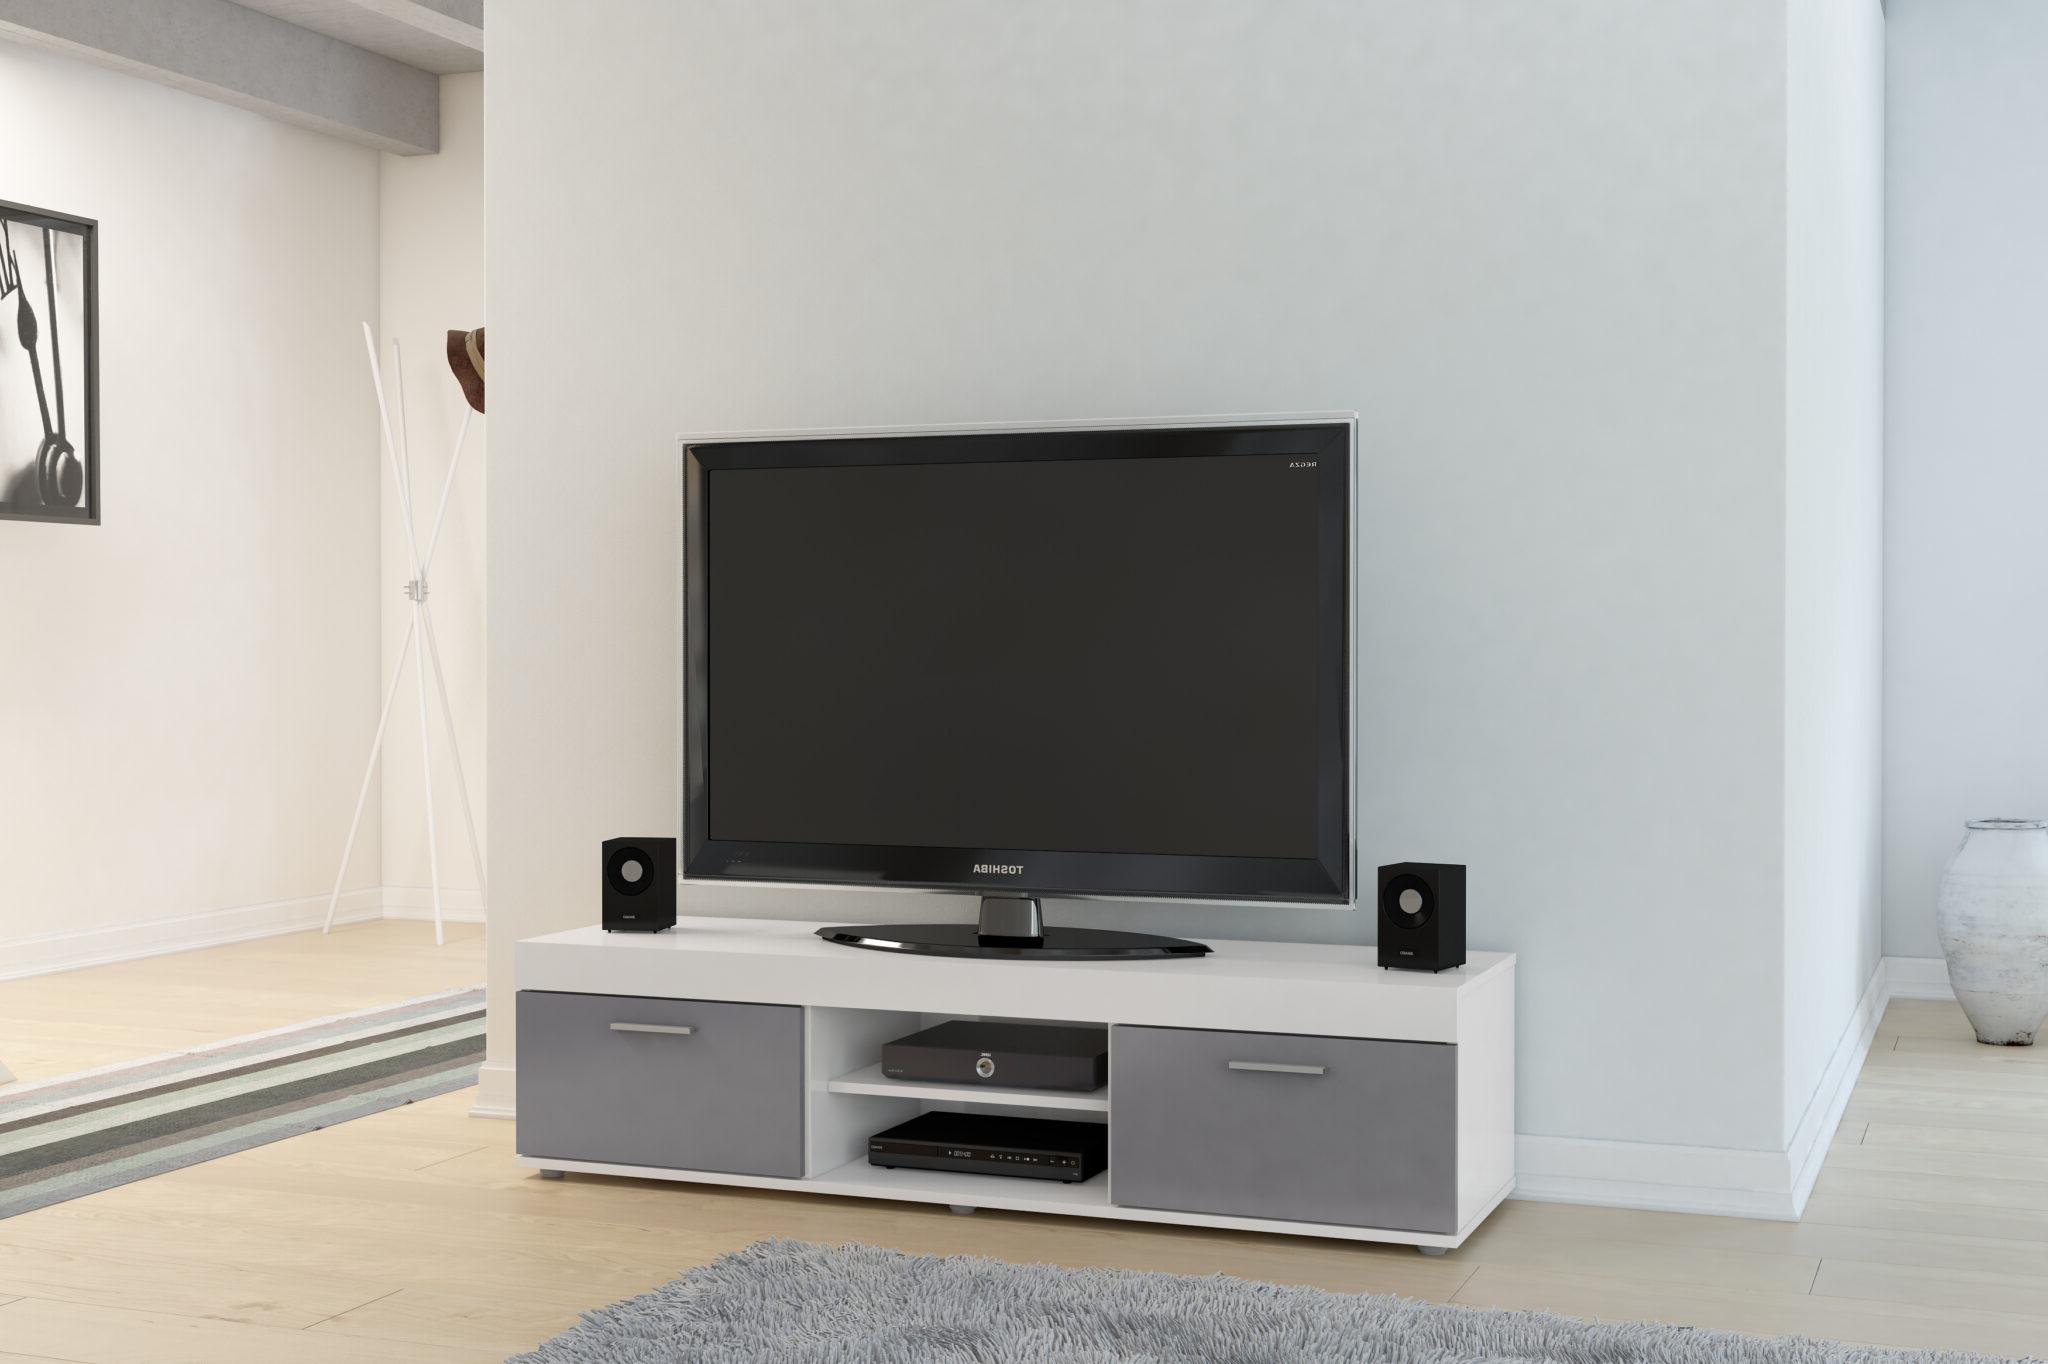 Edgeware Tv Unit – Niture Uk Regarding Popular Edgeware Tv Stands (View 14 of 25)